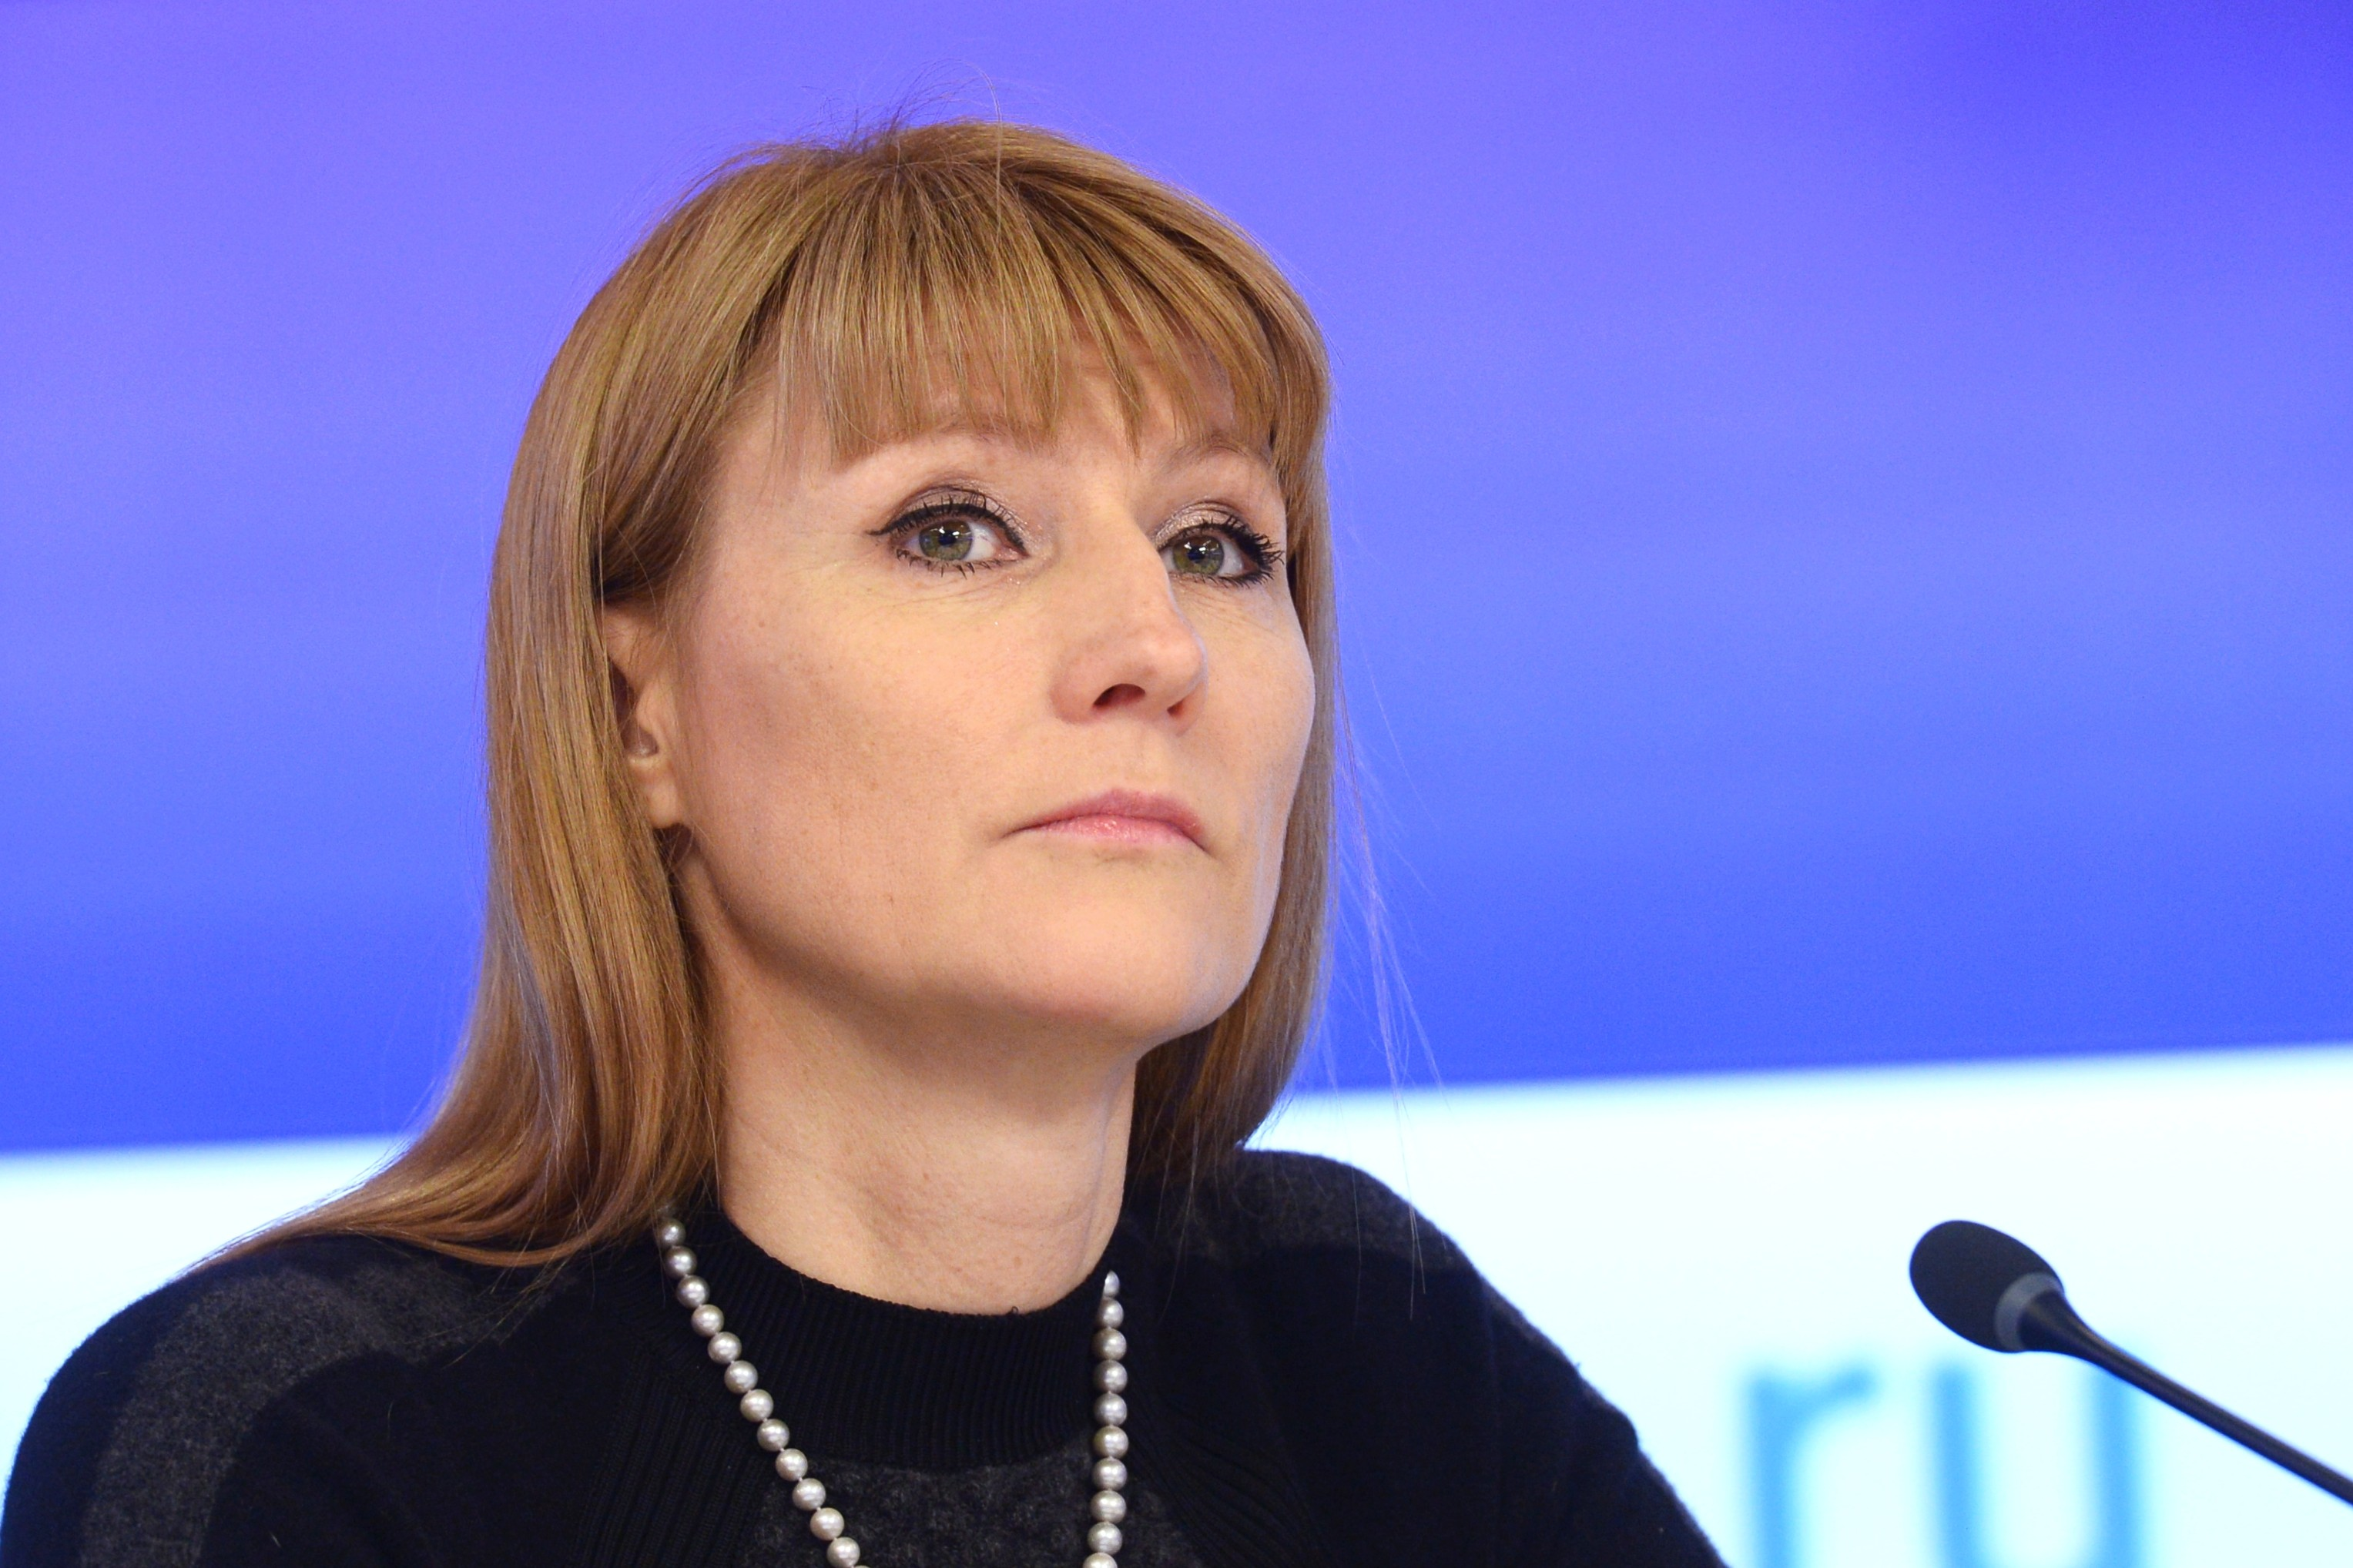 <p><span>Фото: &copy;РИА Новости/Владимир Трефилов</span></p>